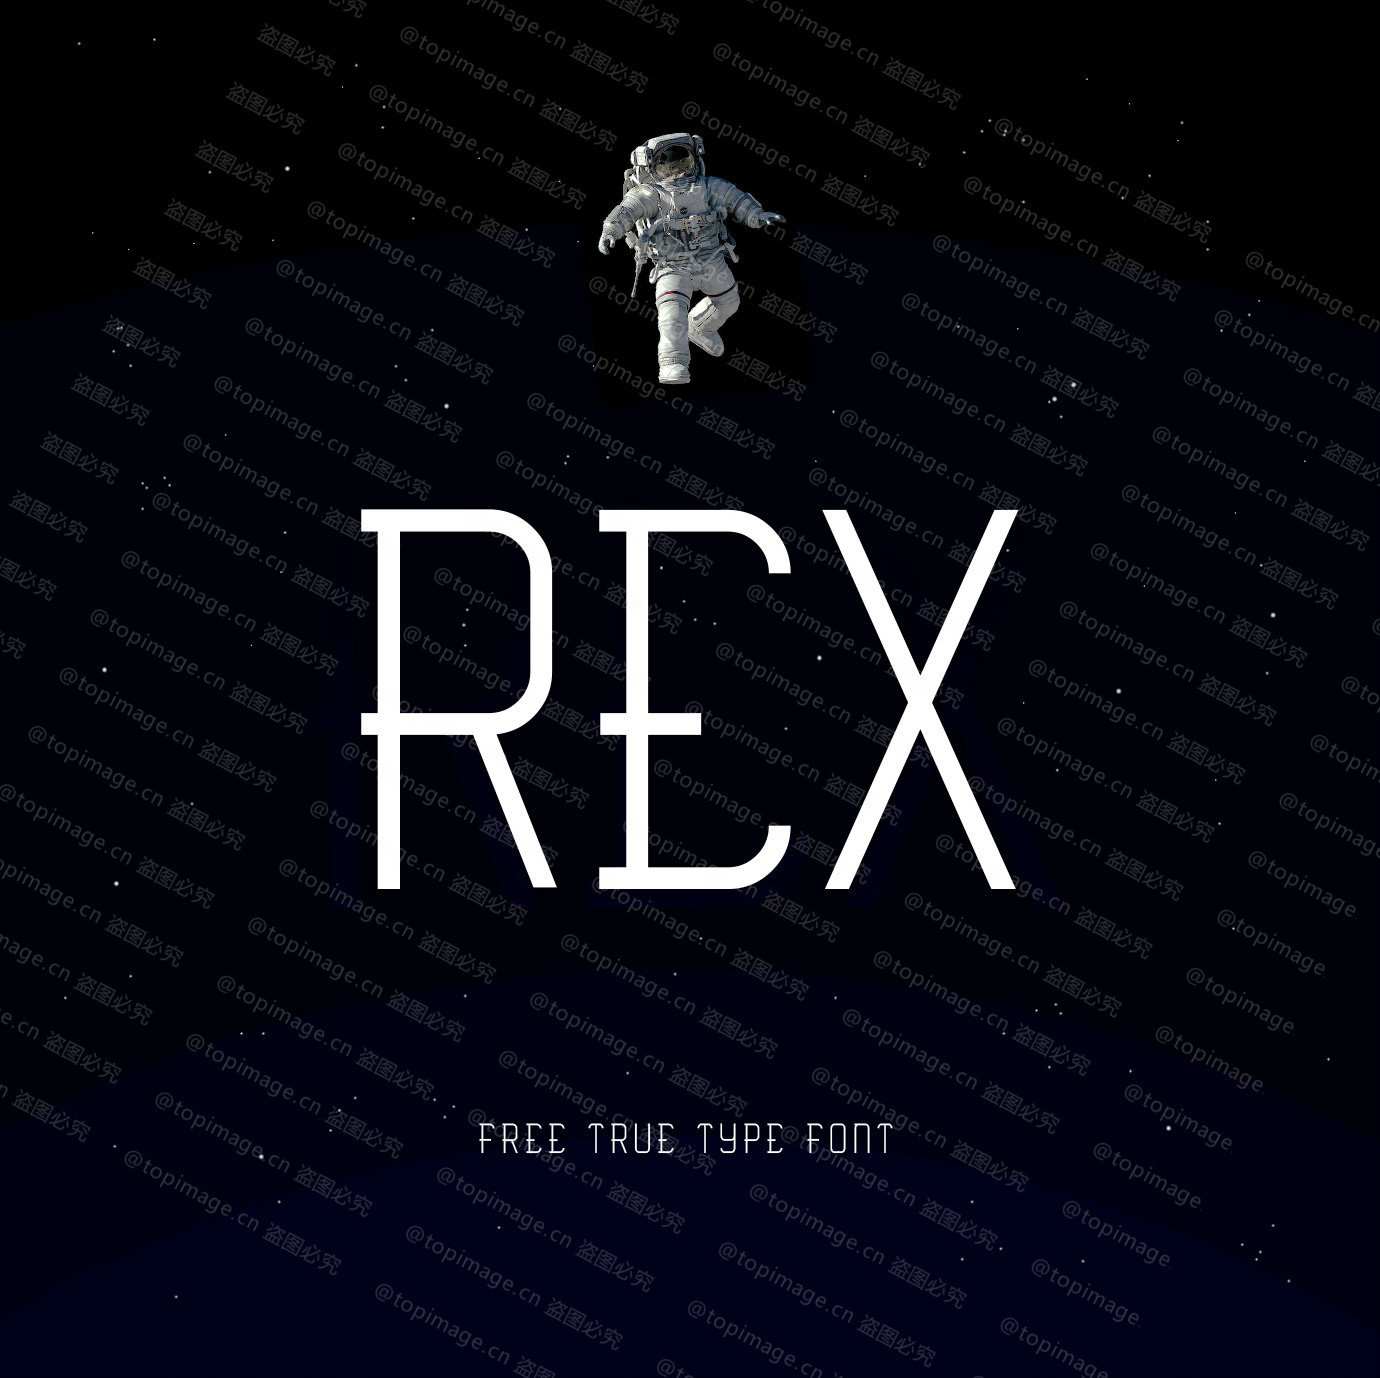 Rex科技现在简约纤细海报英文字体下载